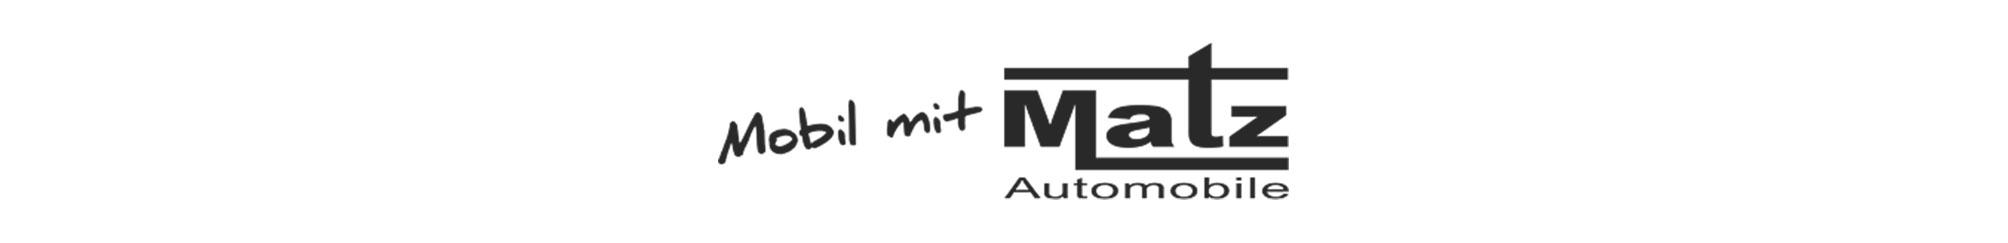 Matz Automobile GmbH